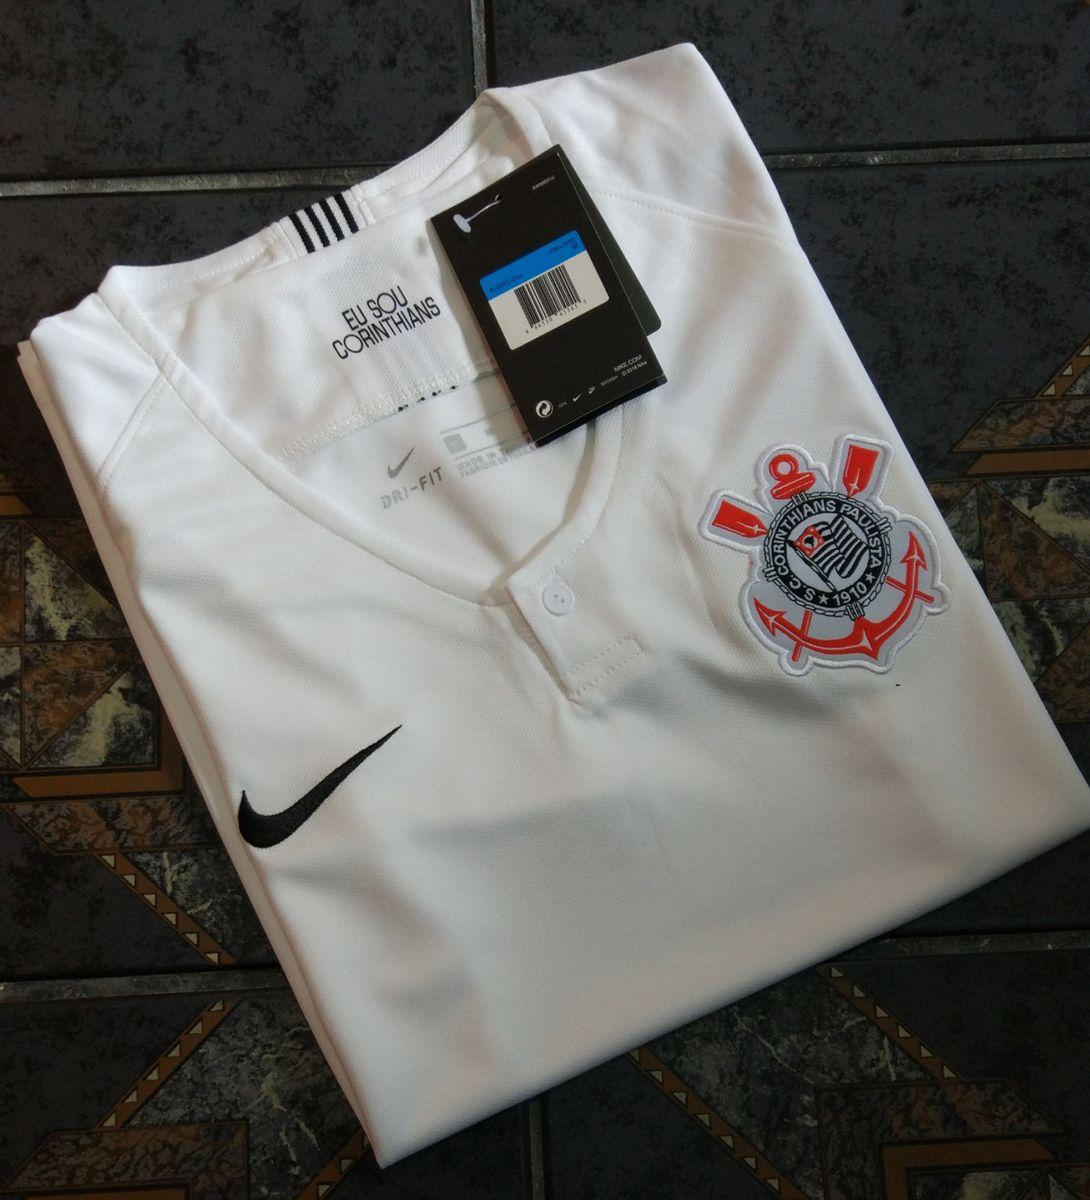 camisa feminina nike corinthians - camisas nike.  Czm6ly9wag90b3muzw5qb2vplmnvbs5ici9wcm9kdwn0cy8xmdmynjcxoc84mwexmjg0mddjndu0nja5mta1mduyogqzztg2mja2zc5qcgc  ... 704e2cf4c2fc5